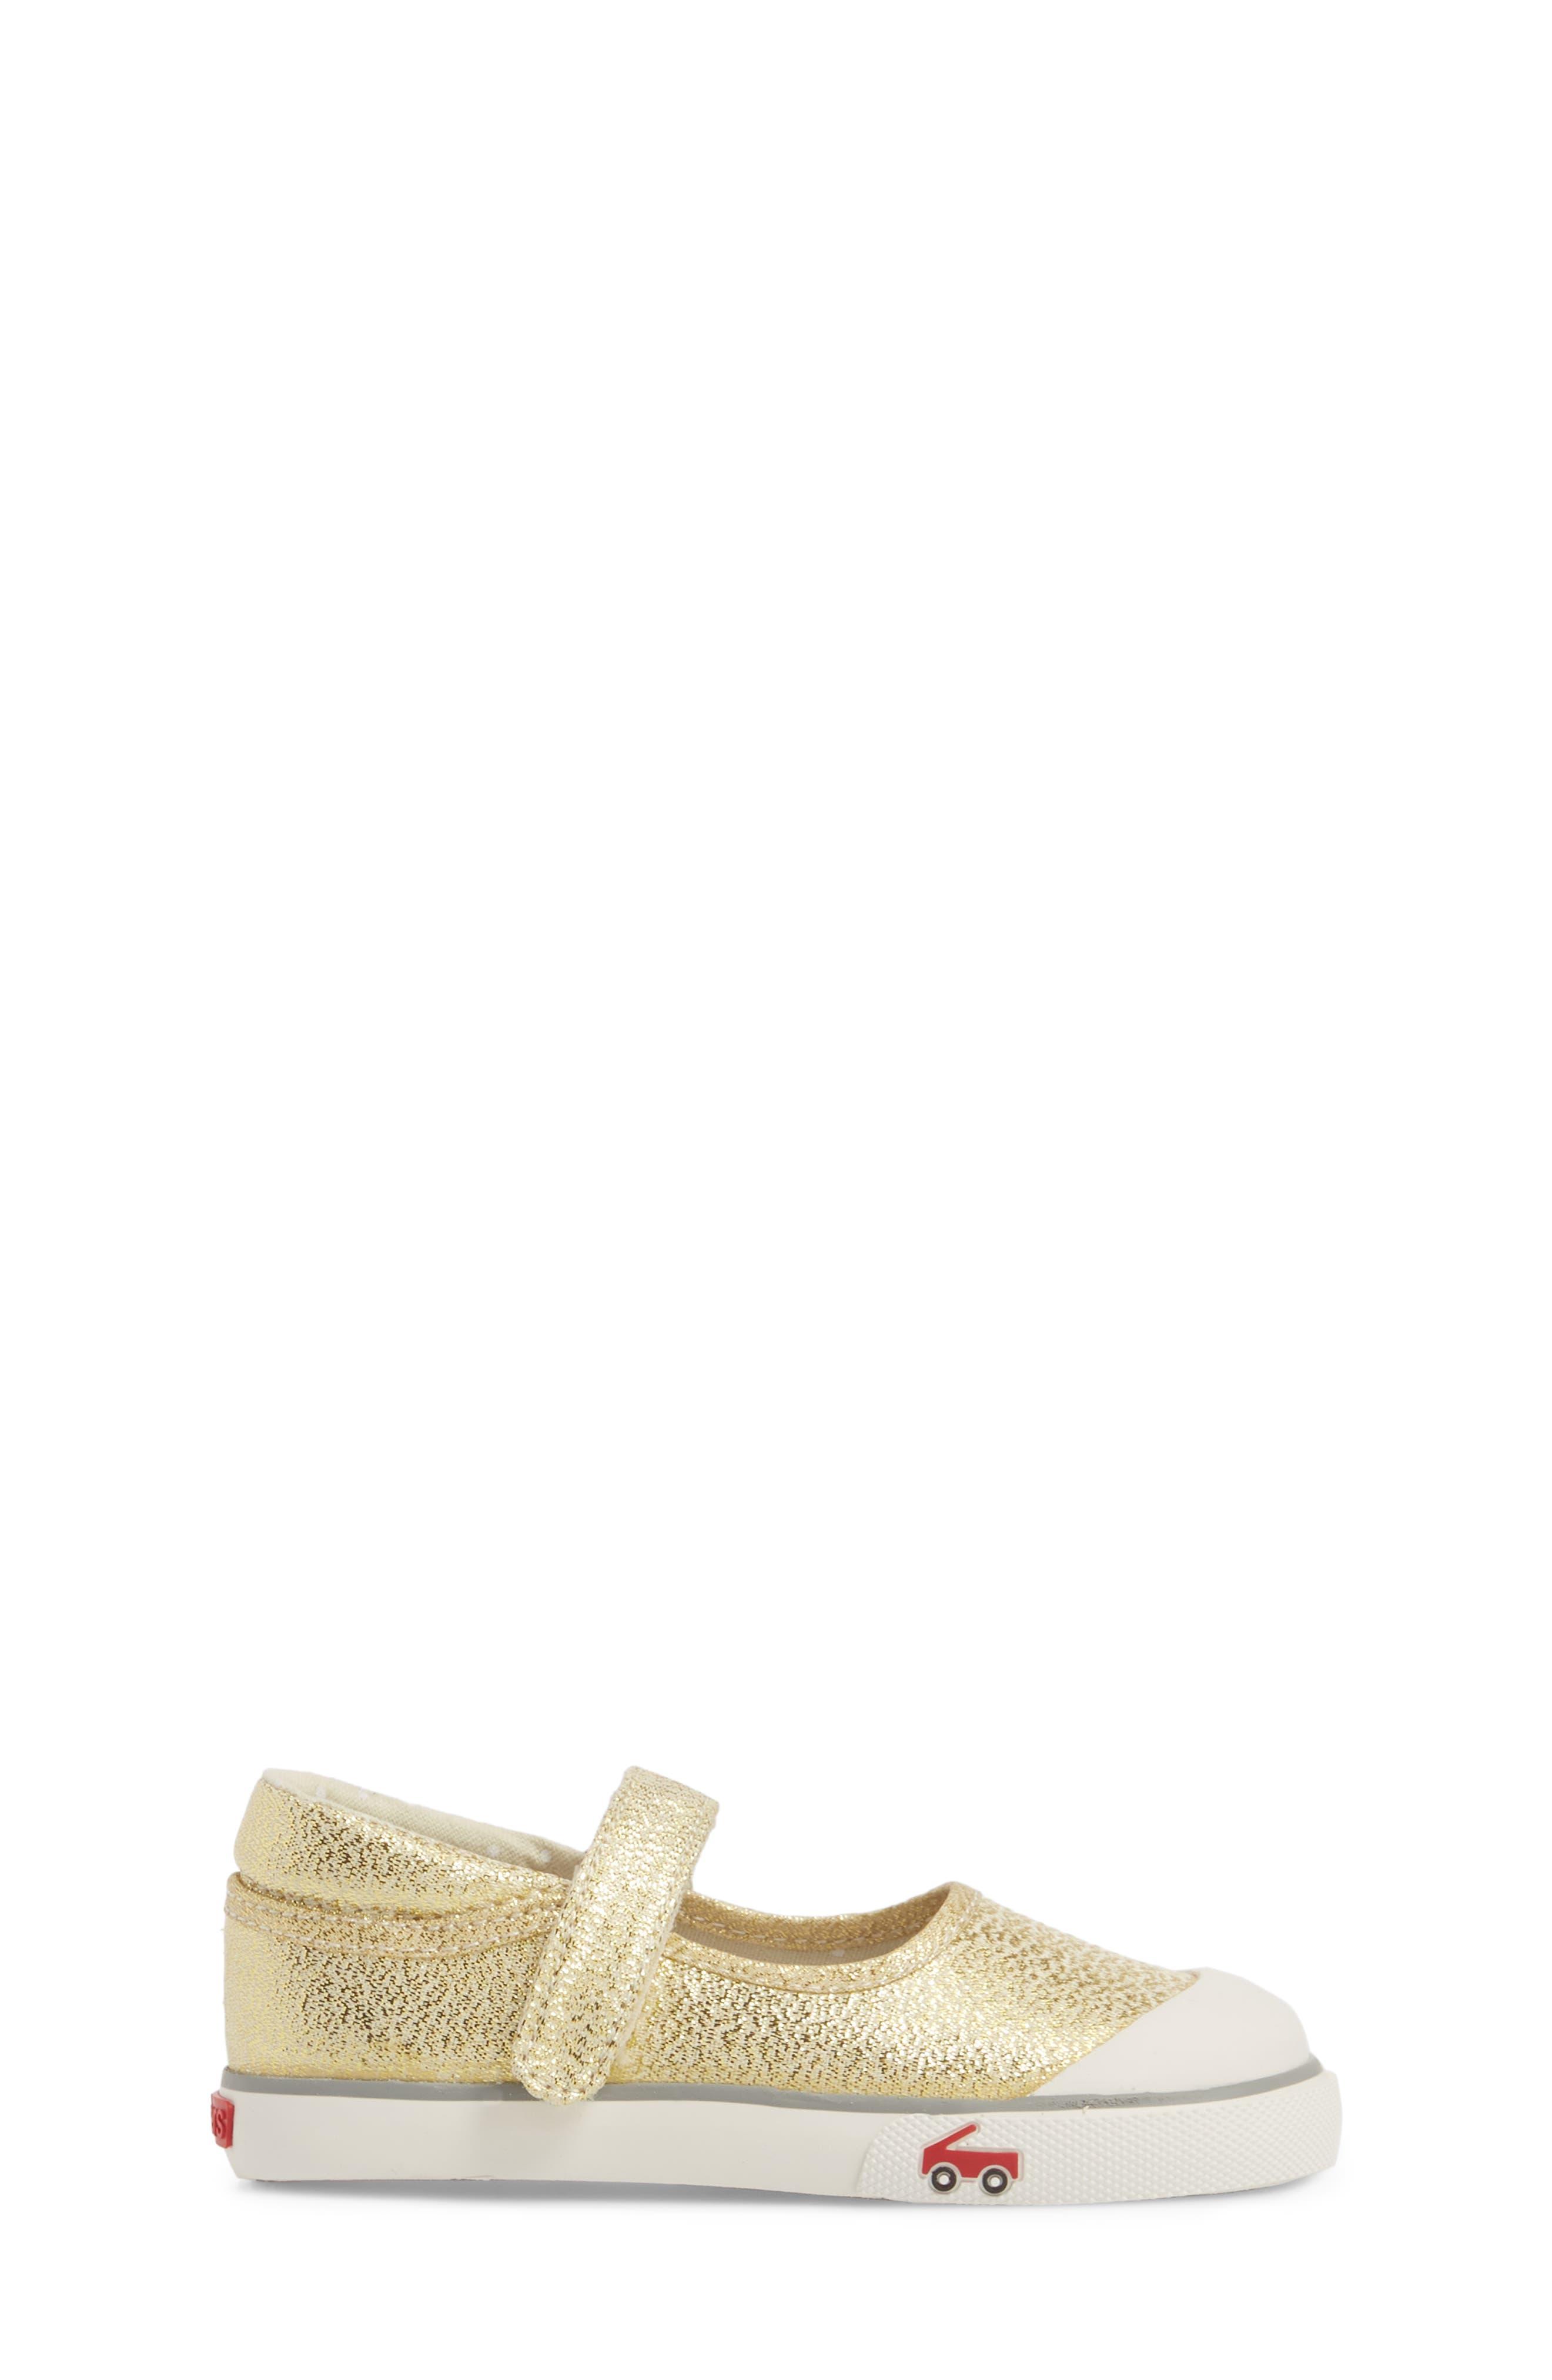 'Marie' Mary Jane Sneaker,                             Alternate thumbnail 3, color,                             METALLIC GOLD